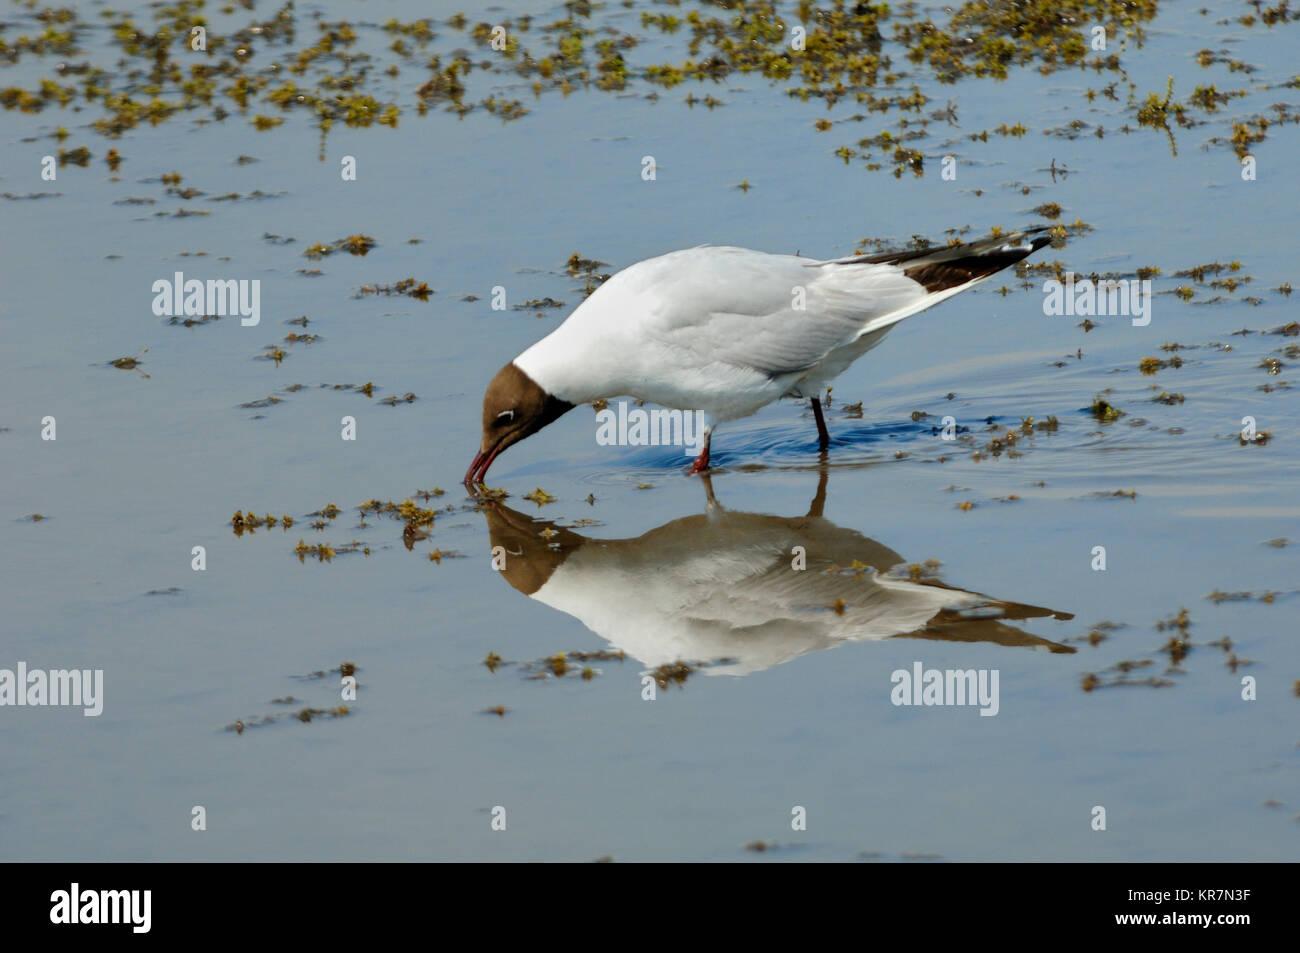 Black-Headed Gull, Larus ridibundus, Feeding in Shallows of Vaccarès Lake or Etang de Vaccarès, Camargue Wetlands, Stock Photo